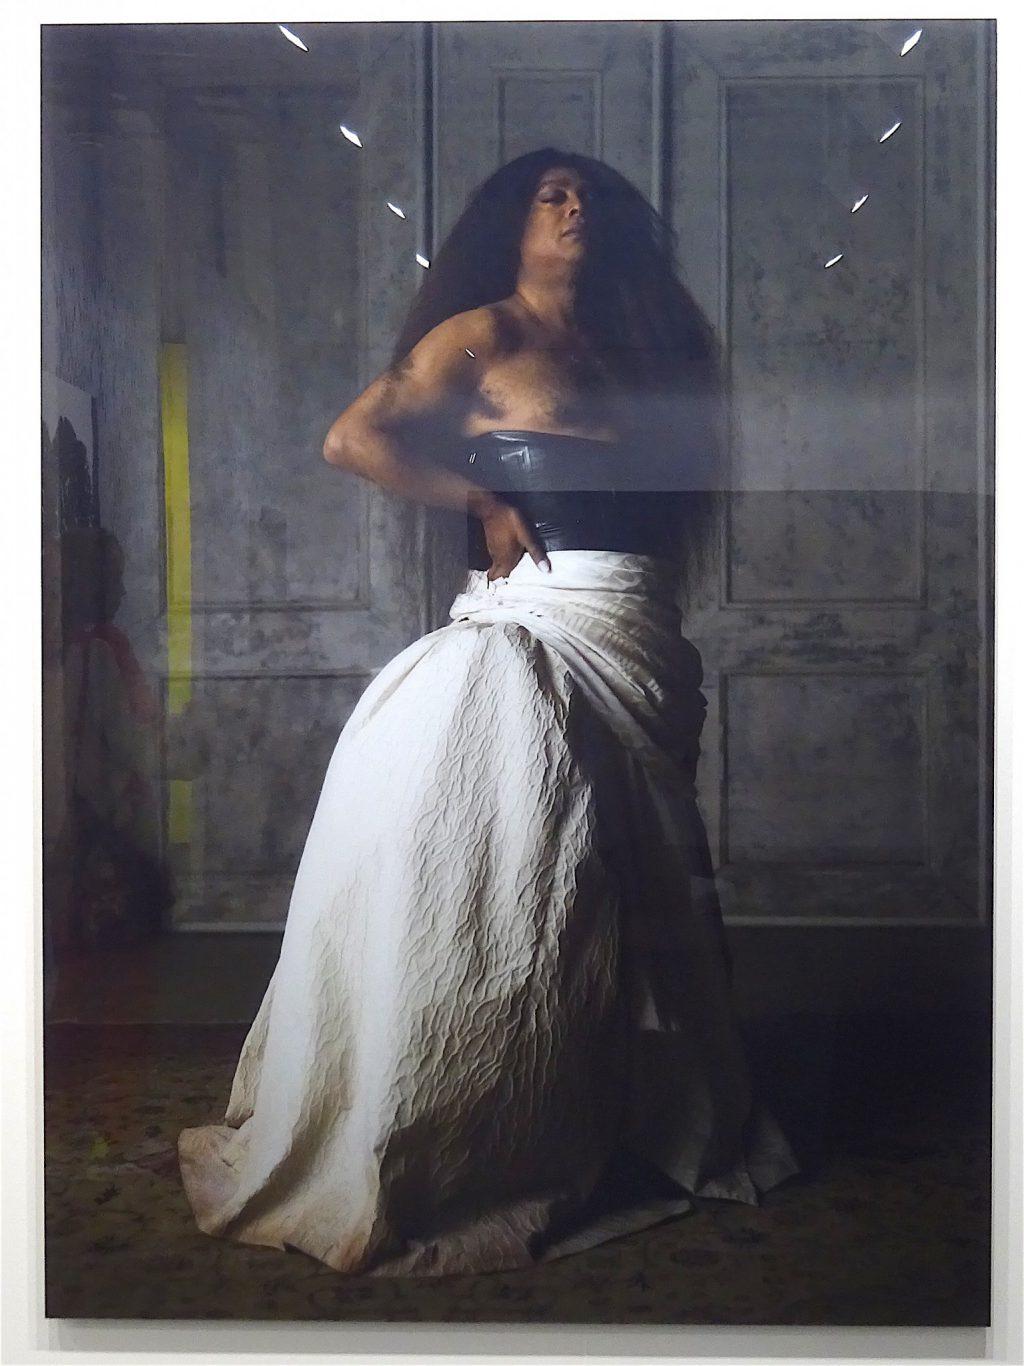 "Artur Jafa ""La Scala"" 2018, Epson fine art print face-mounted to Diasec, acrylic on aluminum panel, 198.1 x 144.8 x 2.5 cm, Edition of 5 with 2 APs @ Gavin Brown Enterprise"